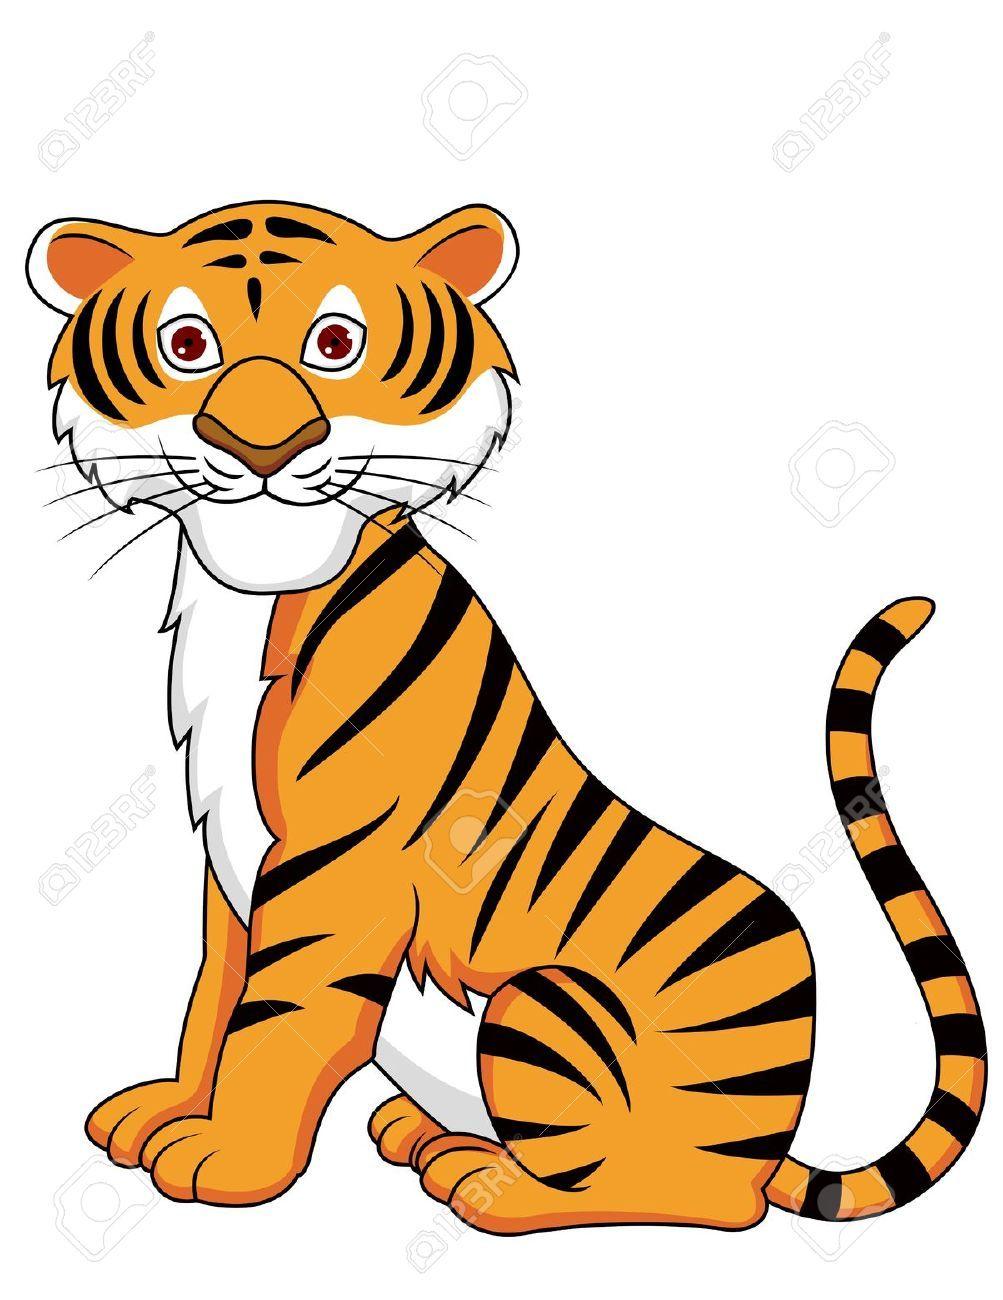 13446433 Tigre De Dibujos Animados Foto De Archivo Jpg 1 003 1 300 Pixeles Dibujo De Animales Dibujos Dibujo Tigre